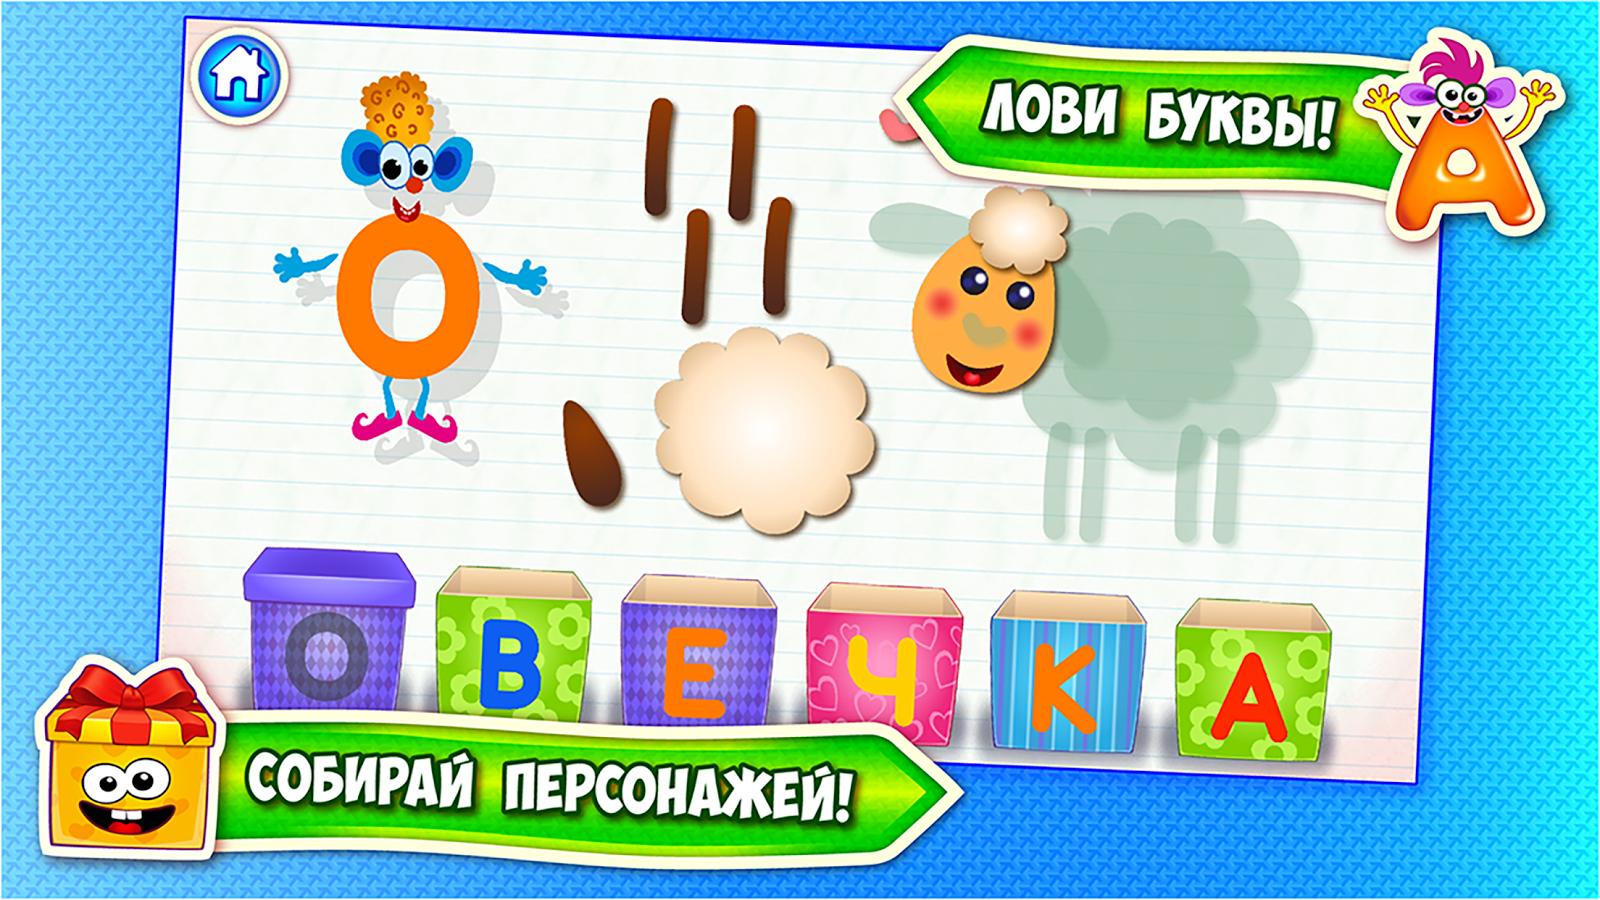 Азбука-алфавит для ... - top-android.org